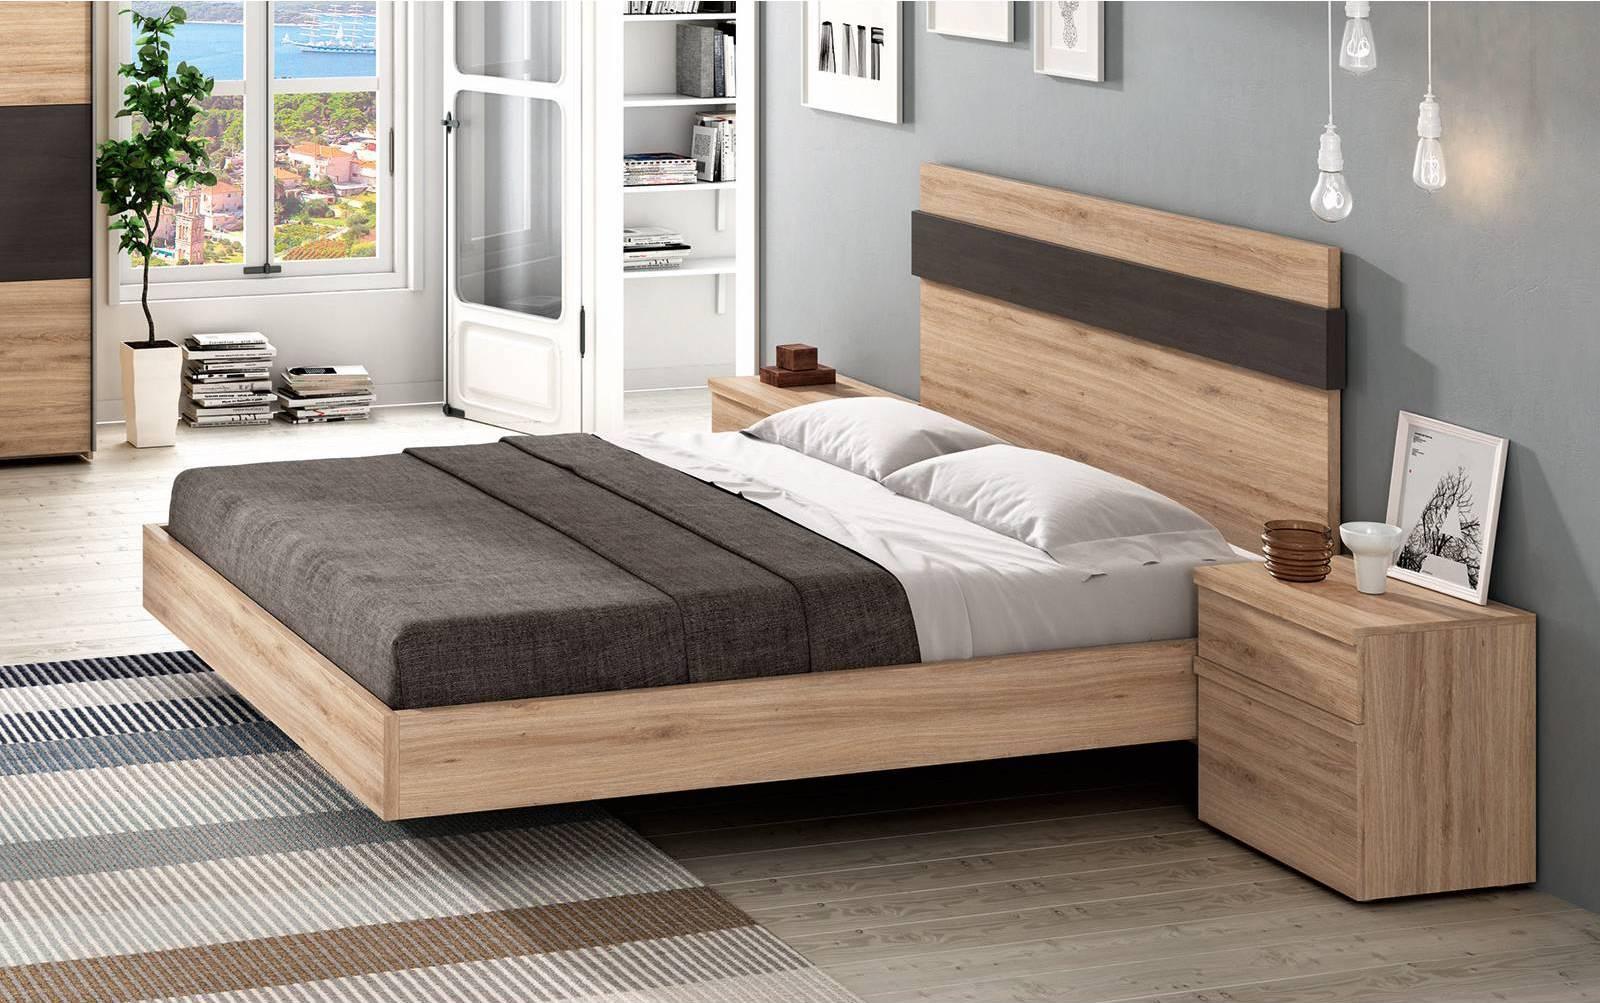 Dormitorios de matrimonio adaptables merkamueble - Vitrinas merkamueble ...